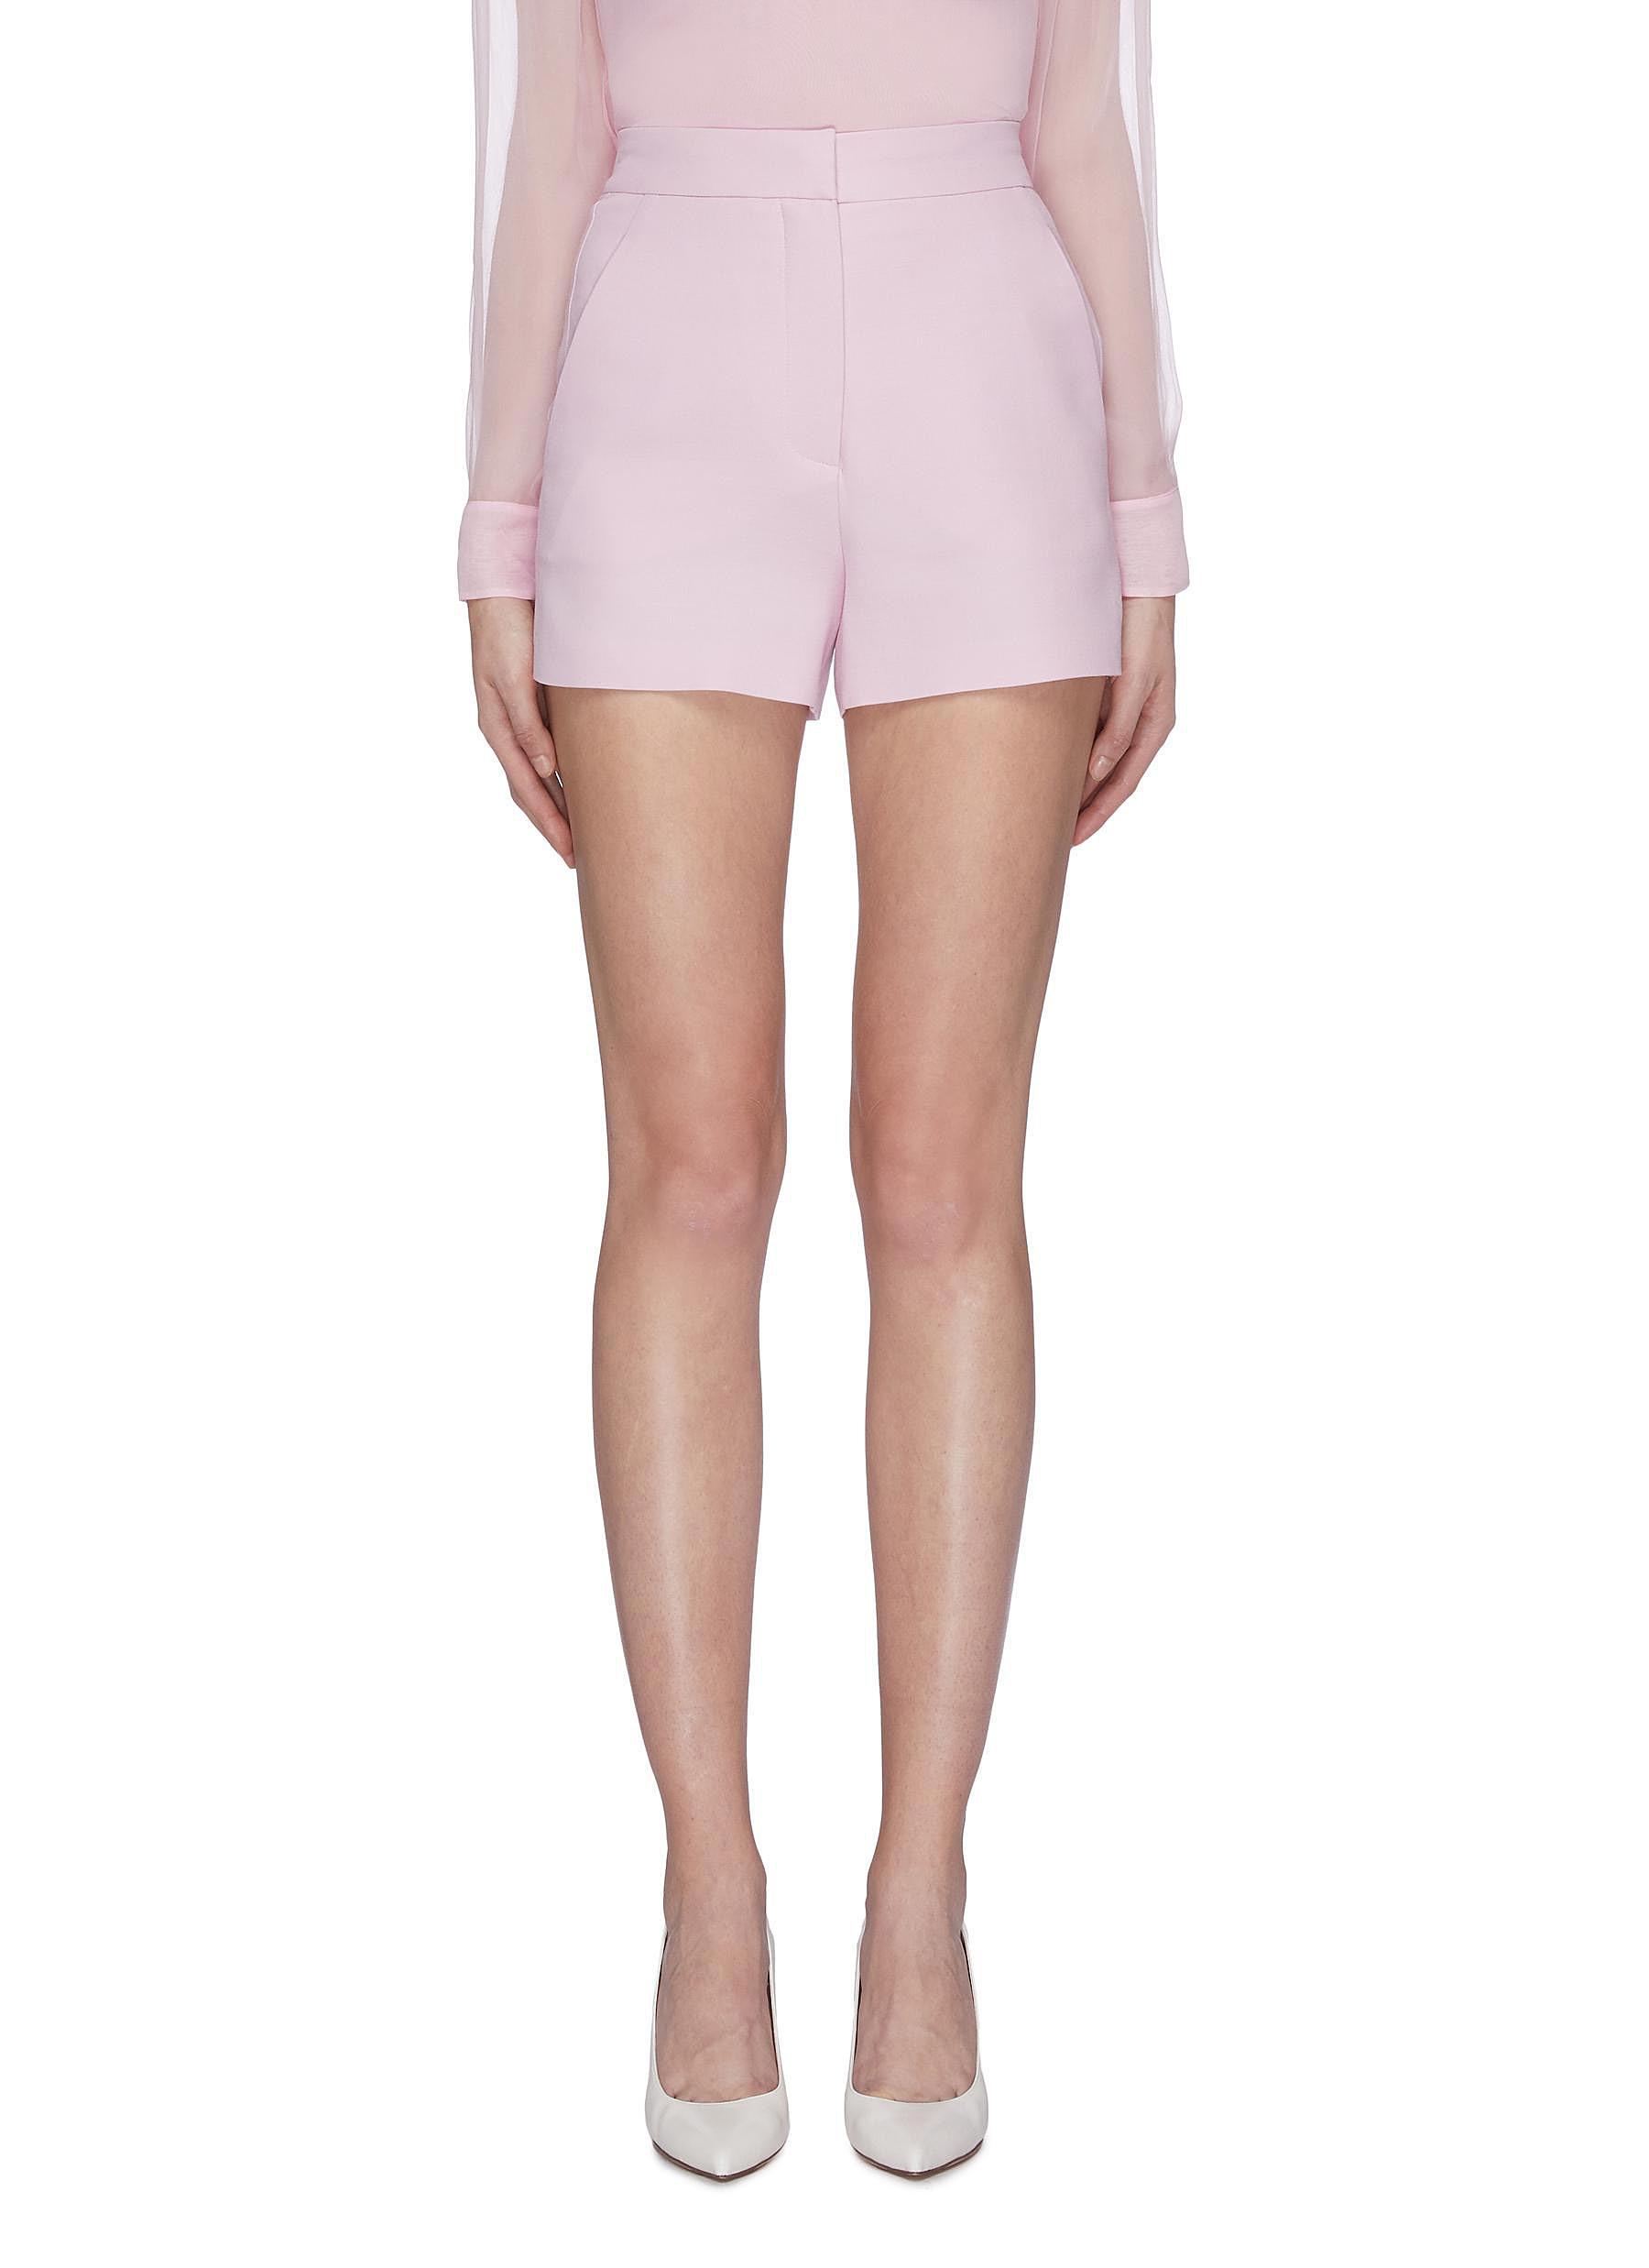 Silk crepe shorts by Valentino